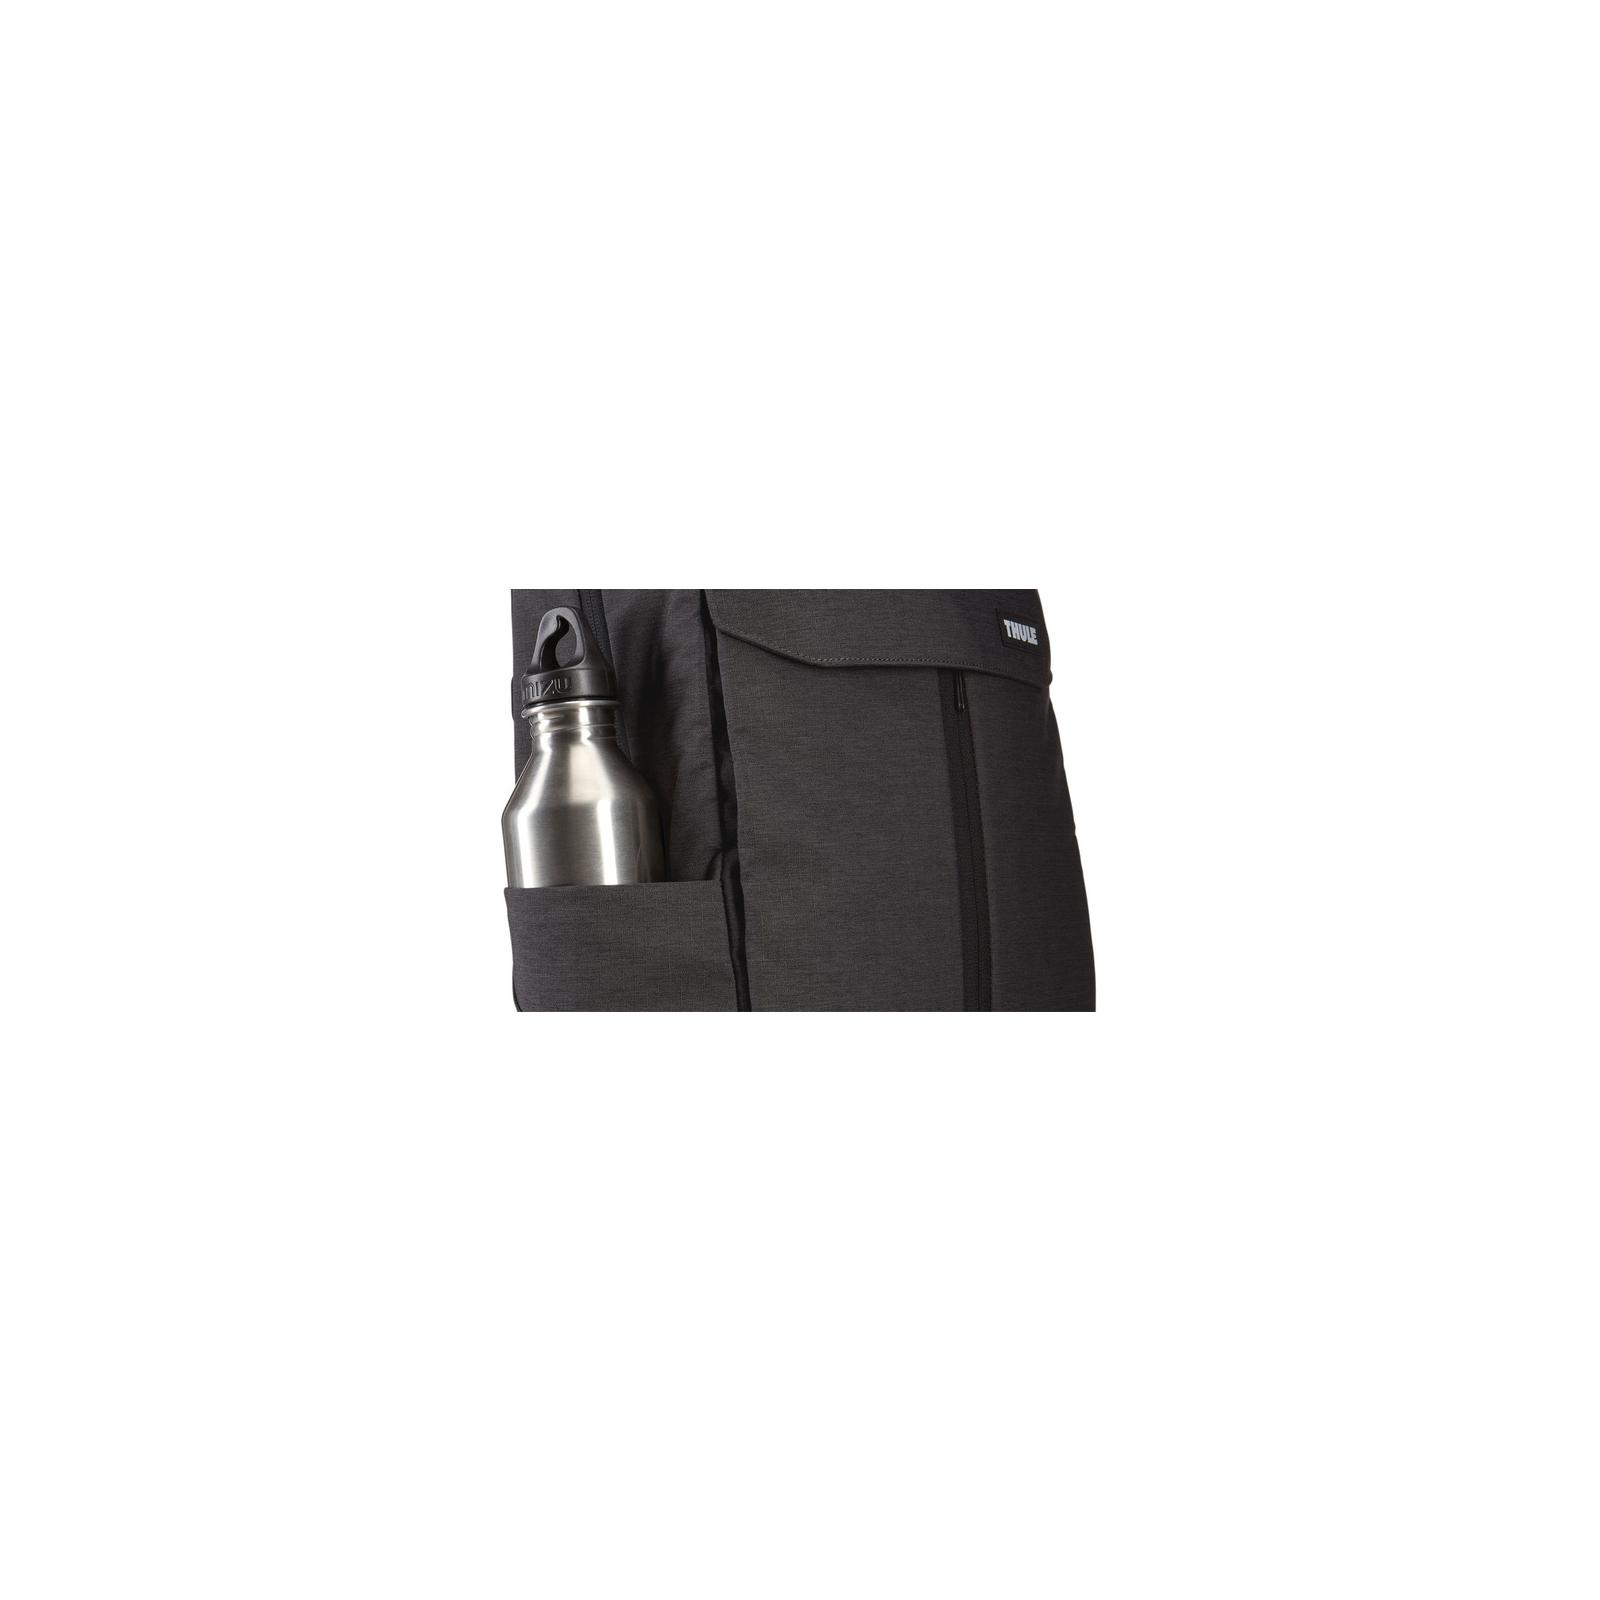 "Рюкзак для ноутбука Thule 15"" Lithos 20L Rooibos/Forest Night TLBP-116 (3203824) изображение 7"